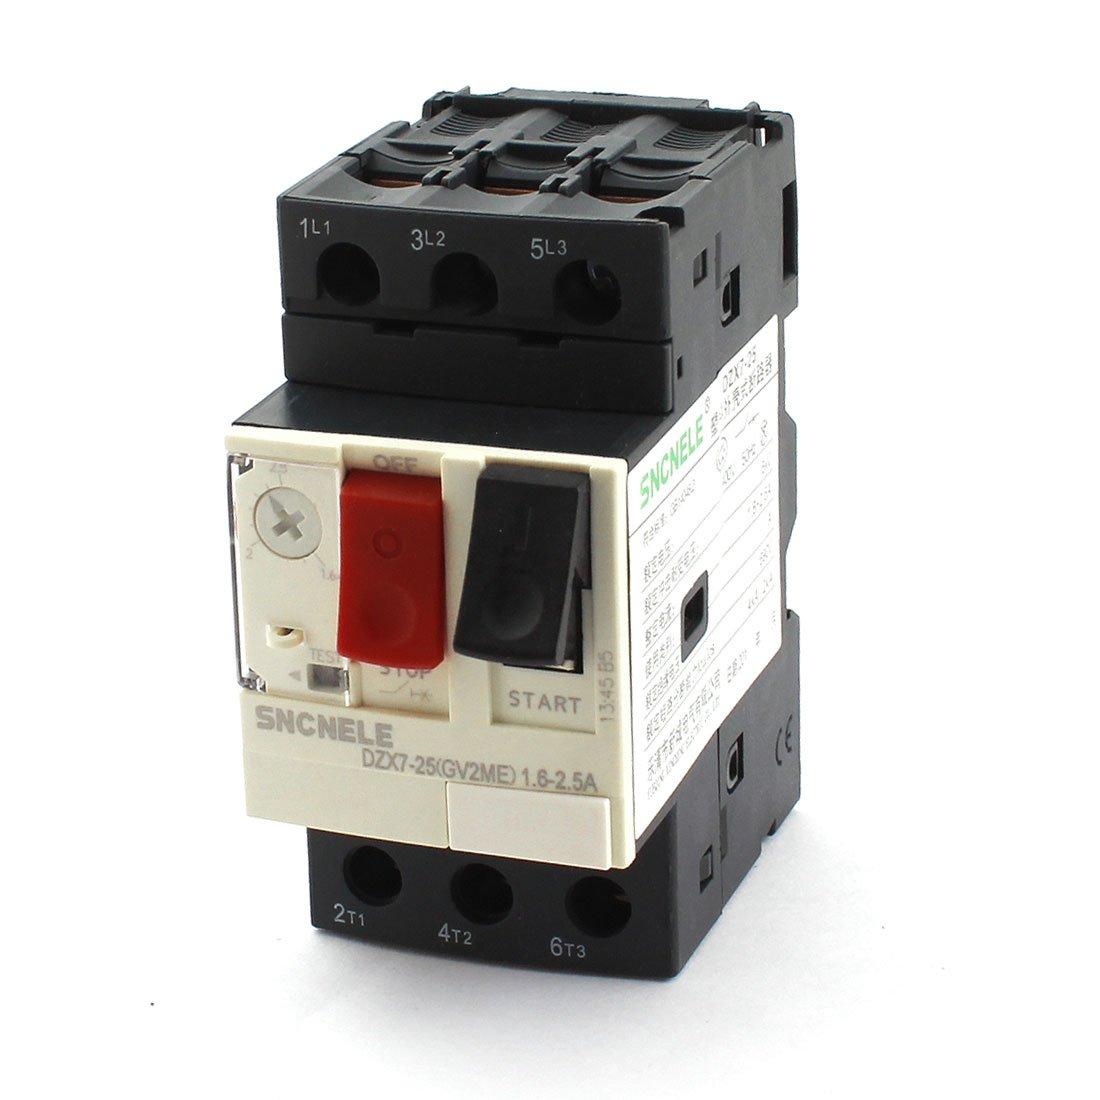 uxcell 1.6-2.5A 690V 6KV ON/OFF Button Black Starting Motor Circuit Breaker